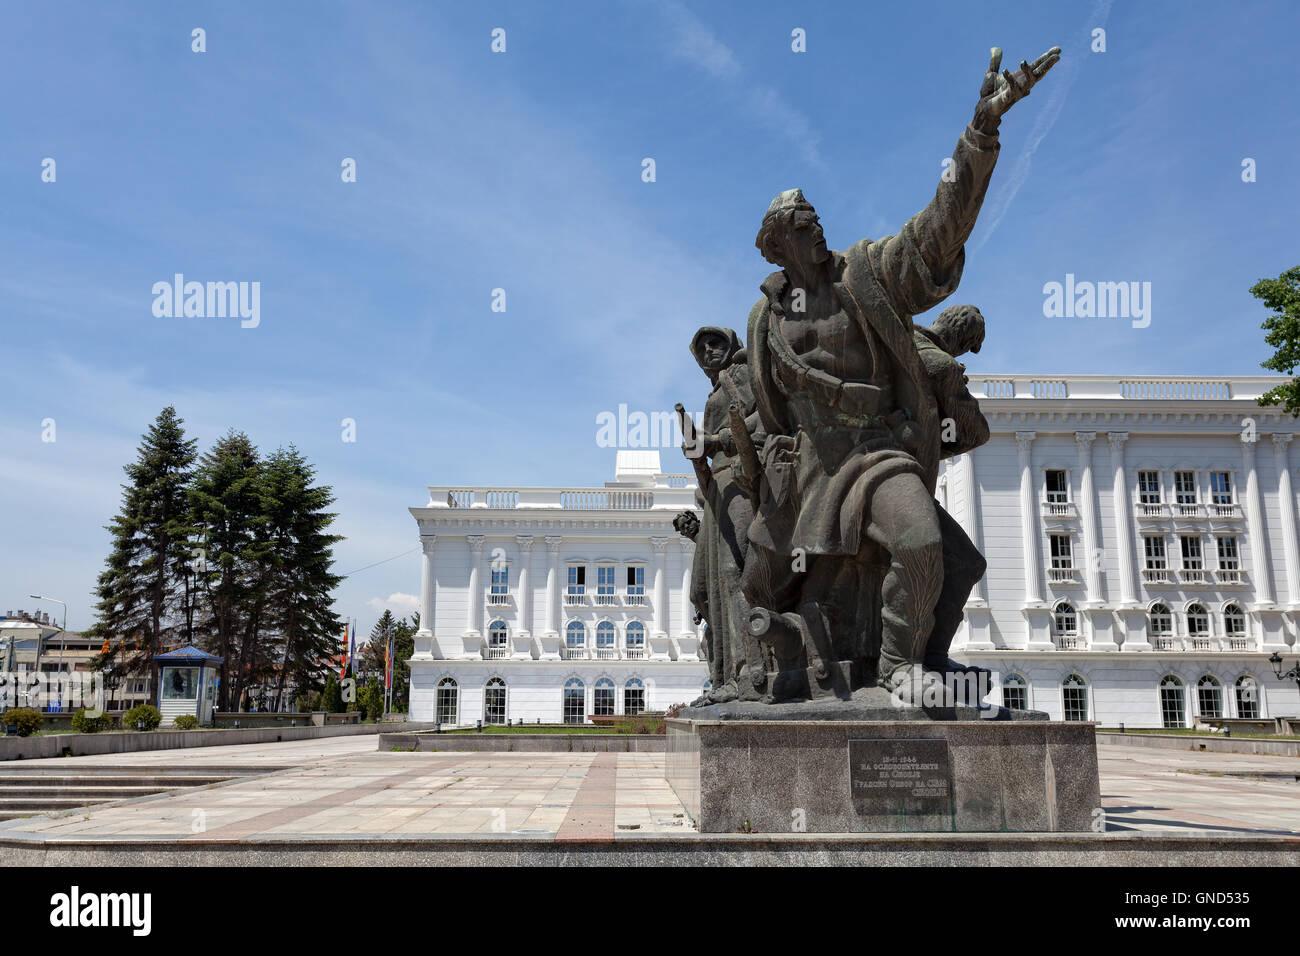 Socialist era monument in Skopje, Macedonia - Stock Image